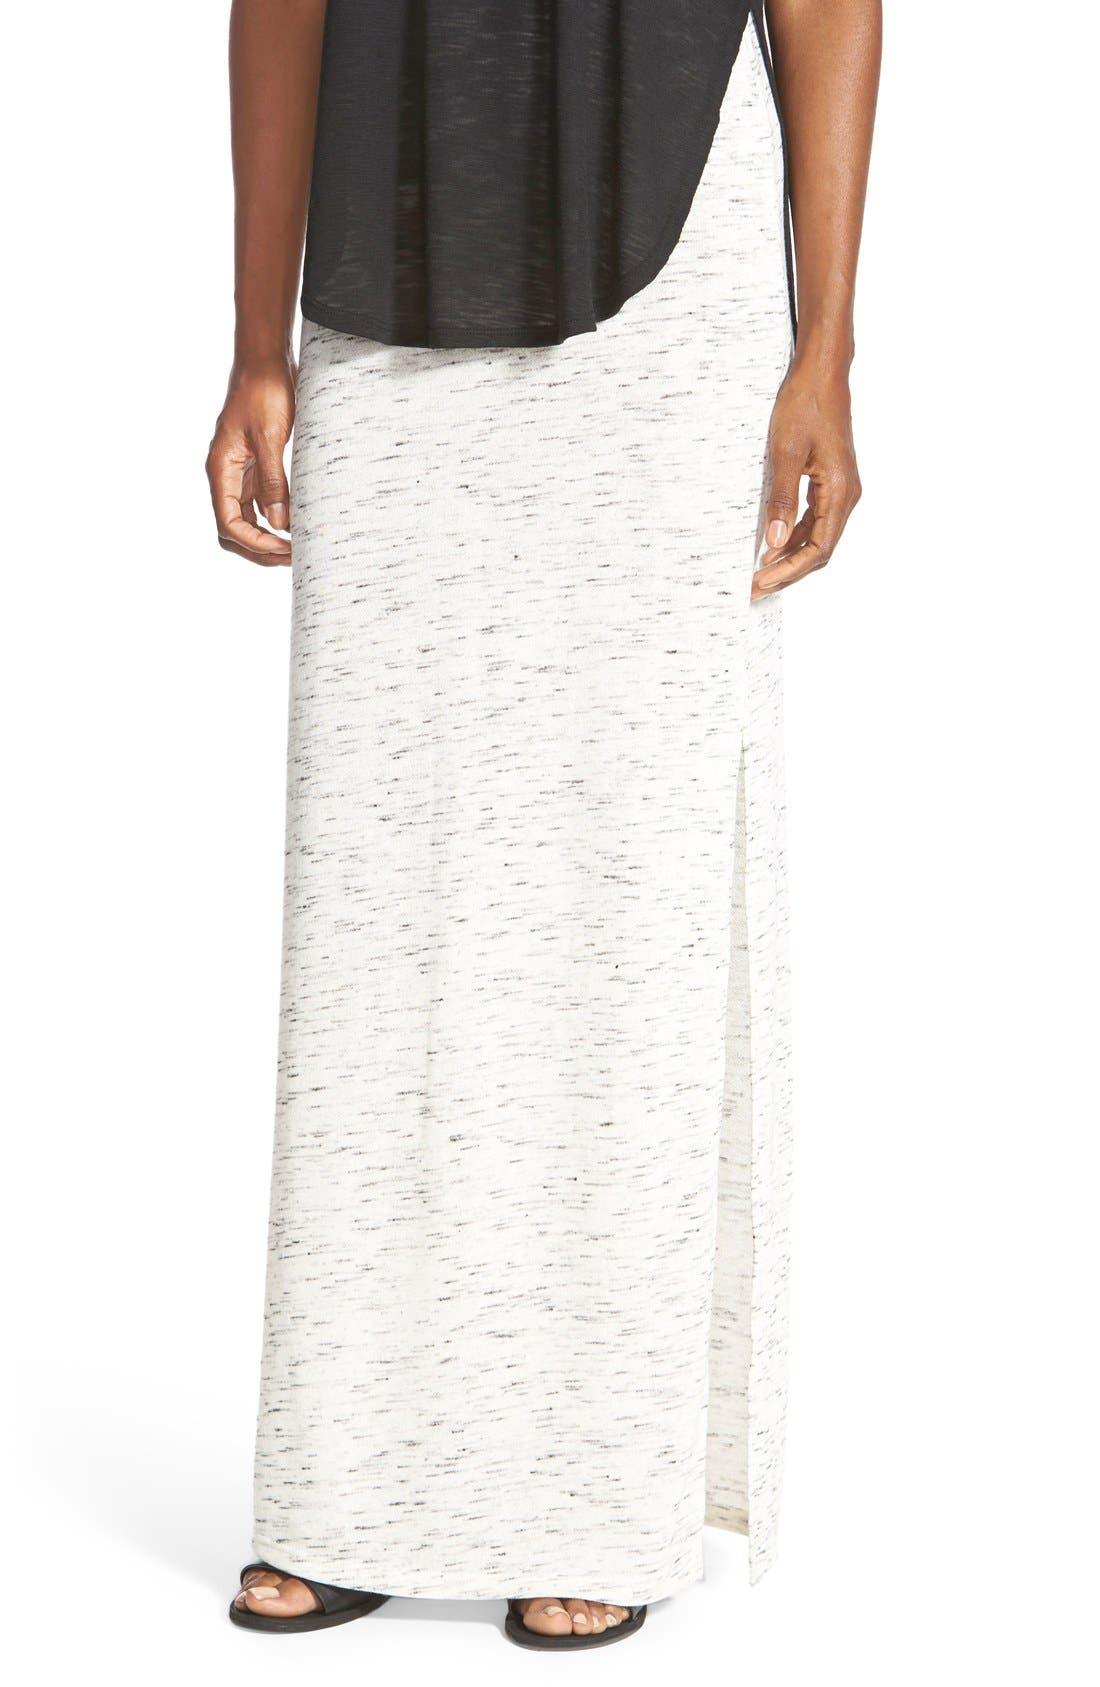 Main Image - The Hanger Heathered Knit Maxi Skirt (Juniors)